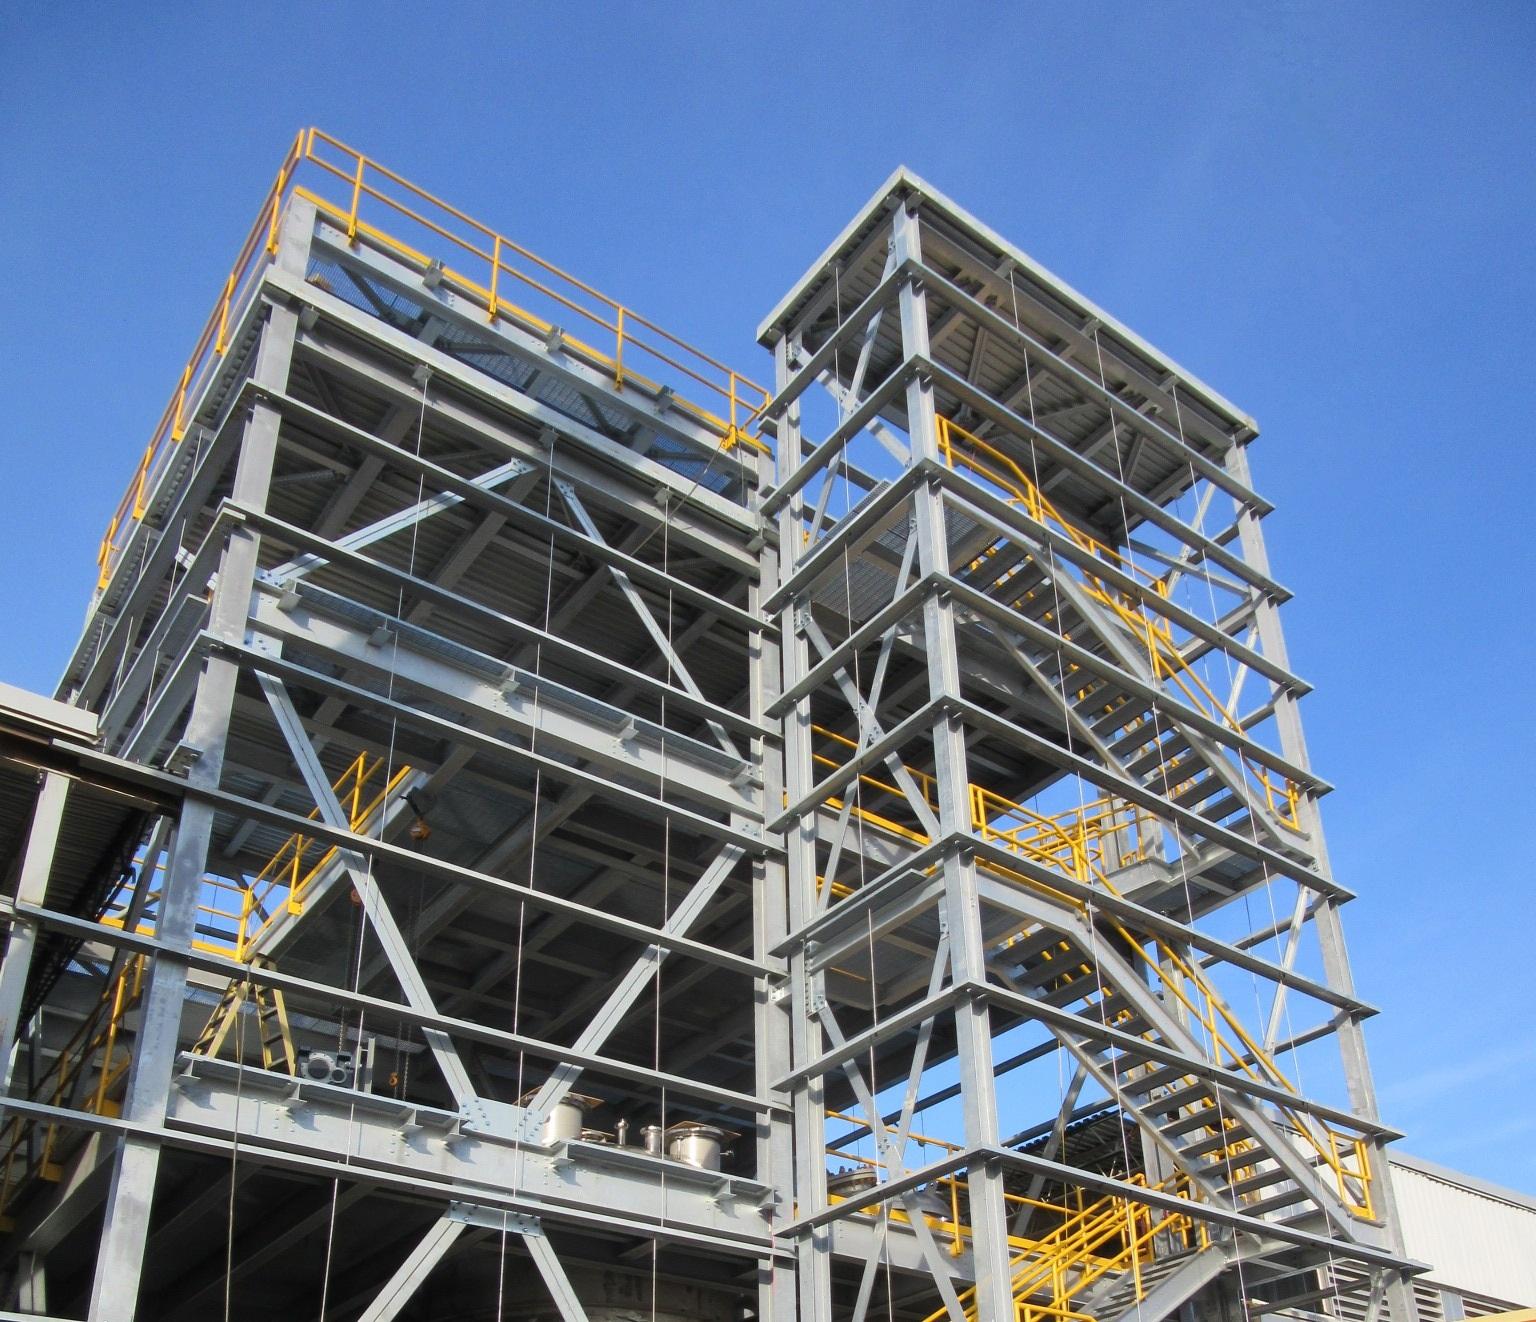 EMERY OLEOCHEMICALS - GLYCOLYSIS BUILDING 66A